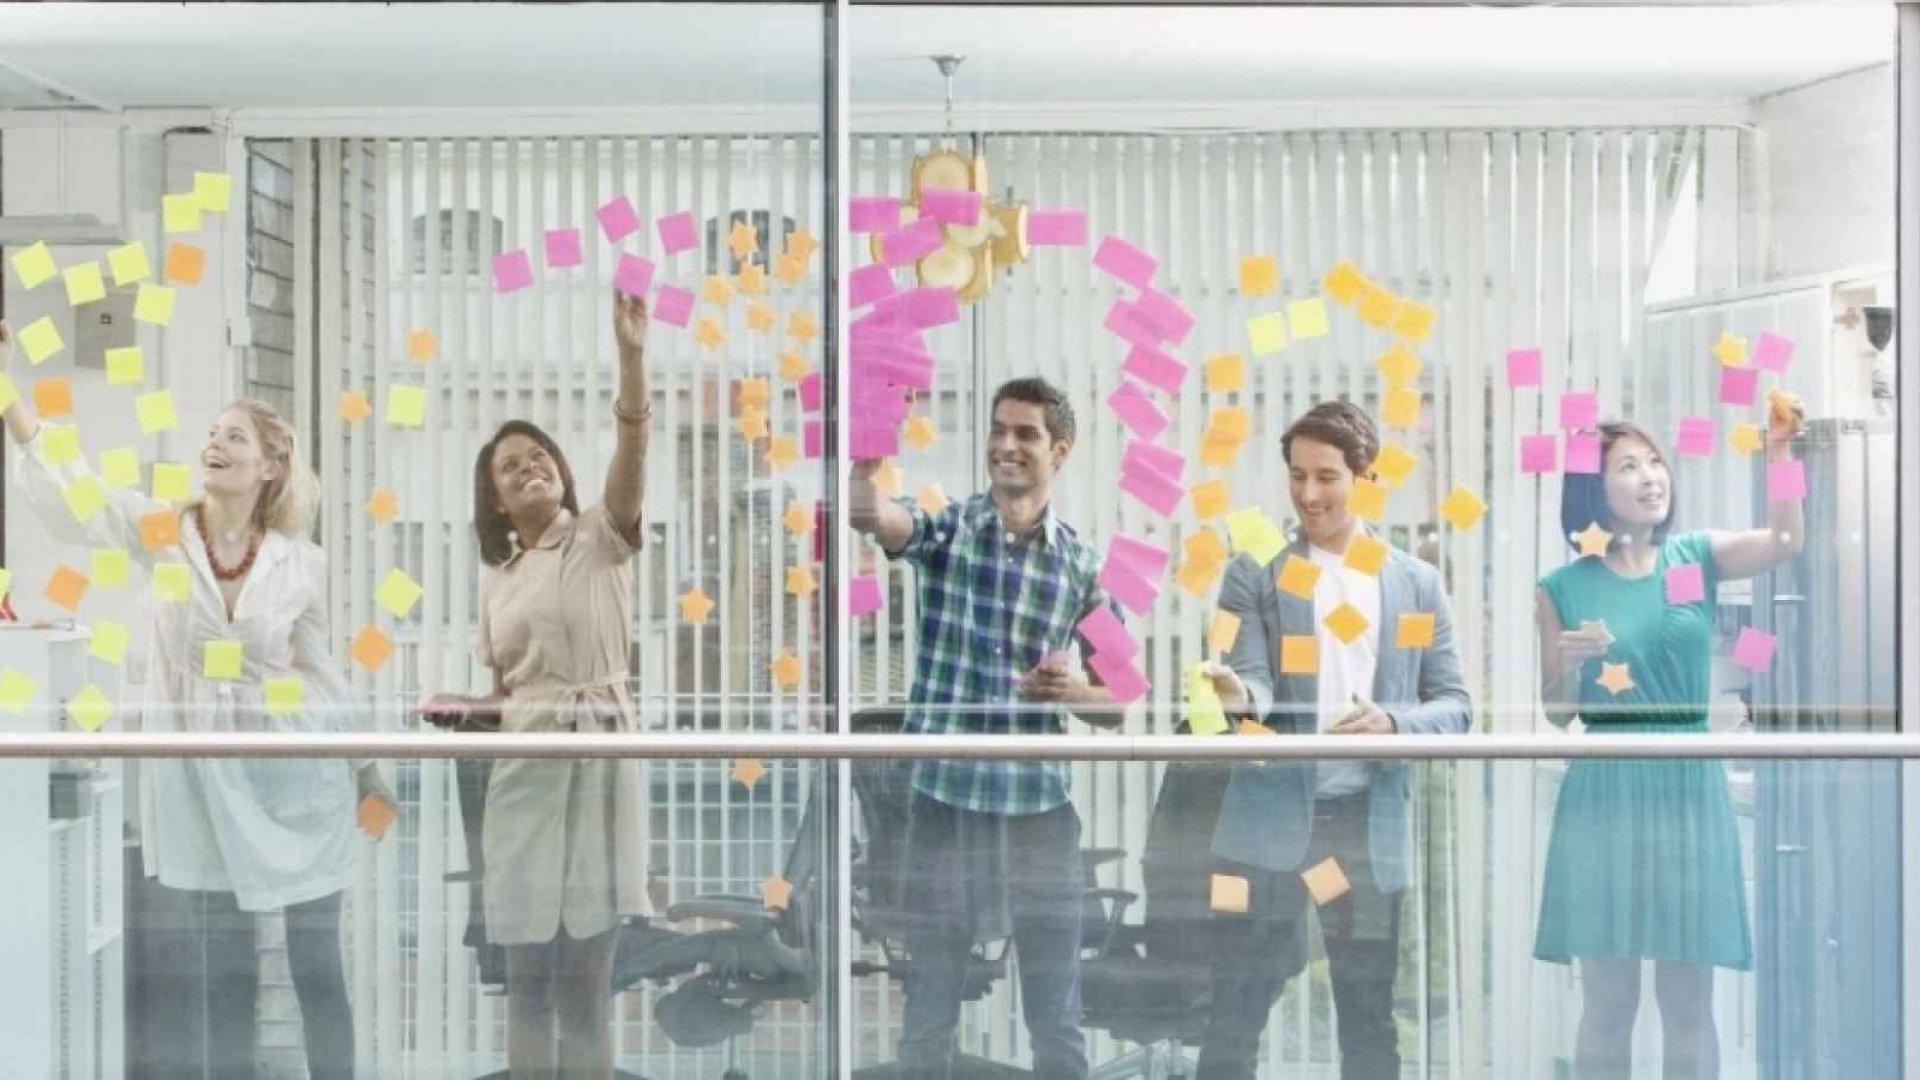 5 Ways to Unlock Your Team's Creative Powers